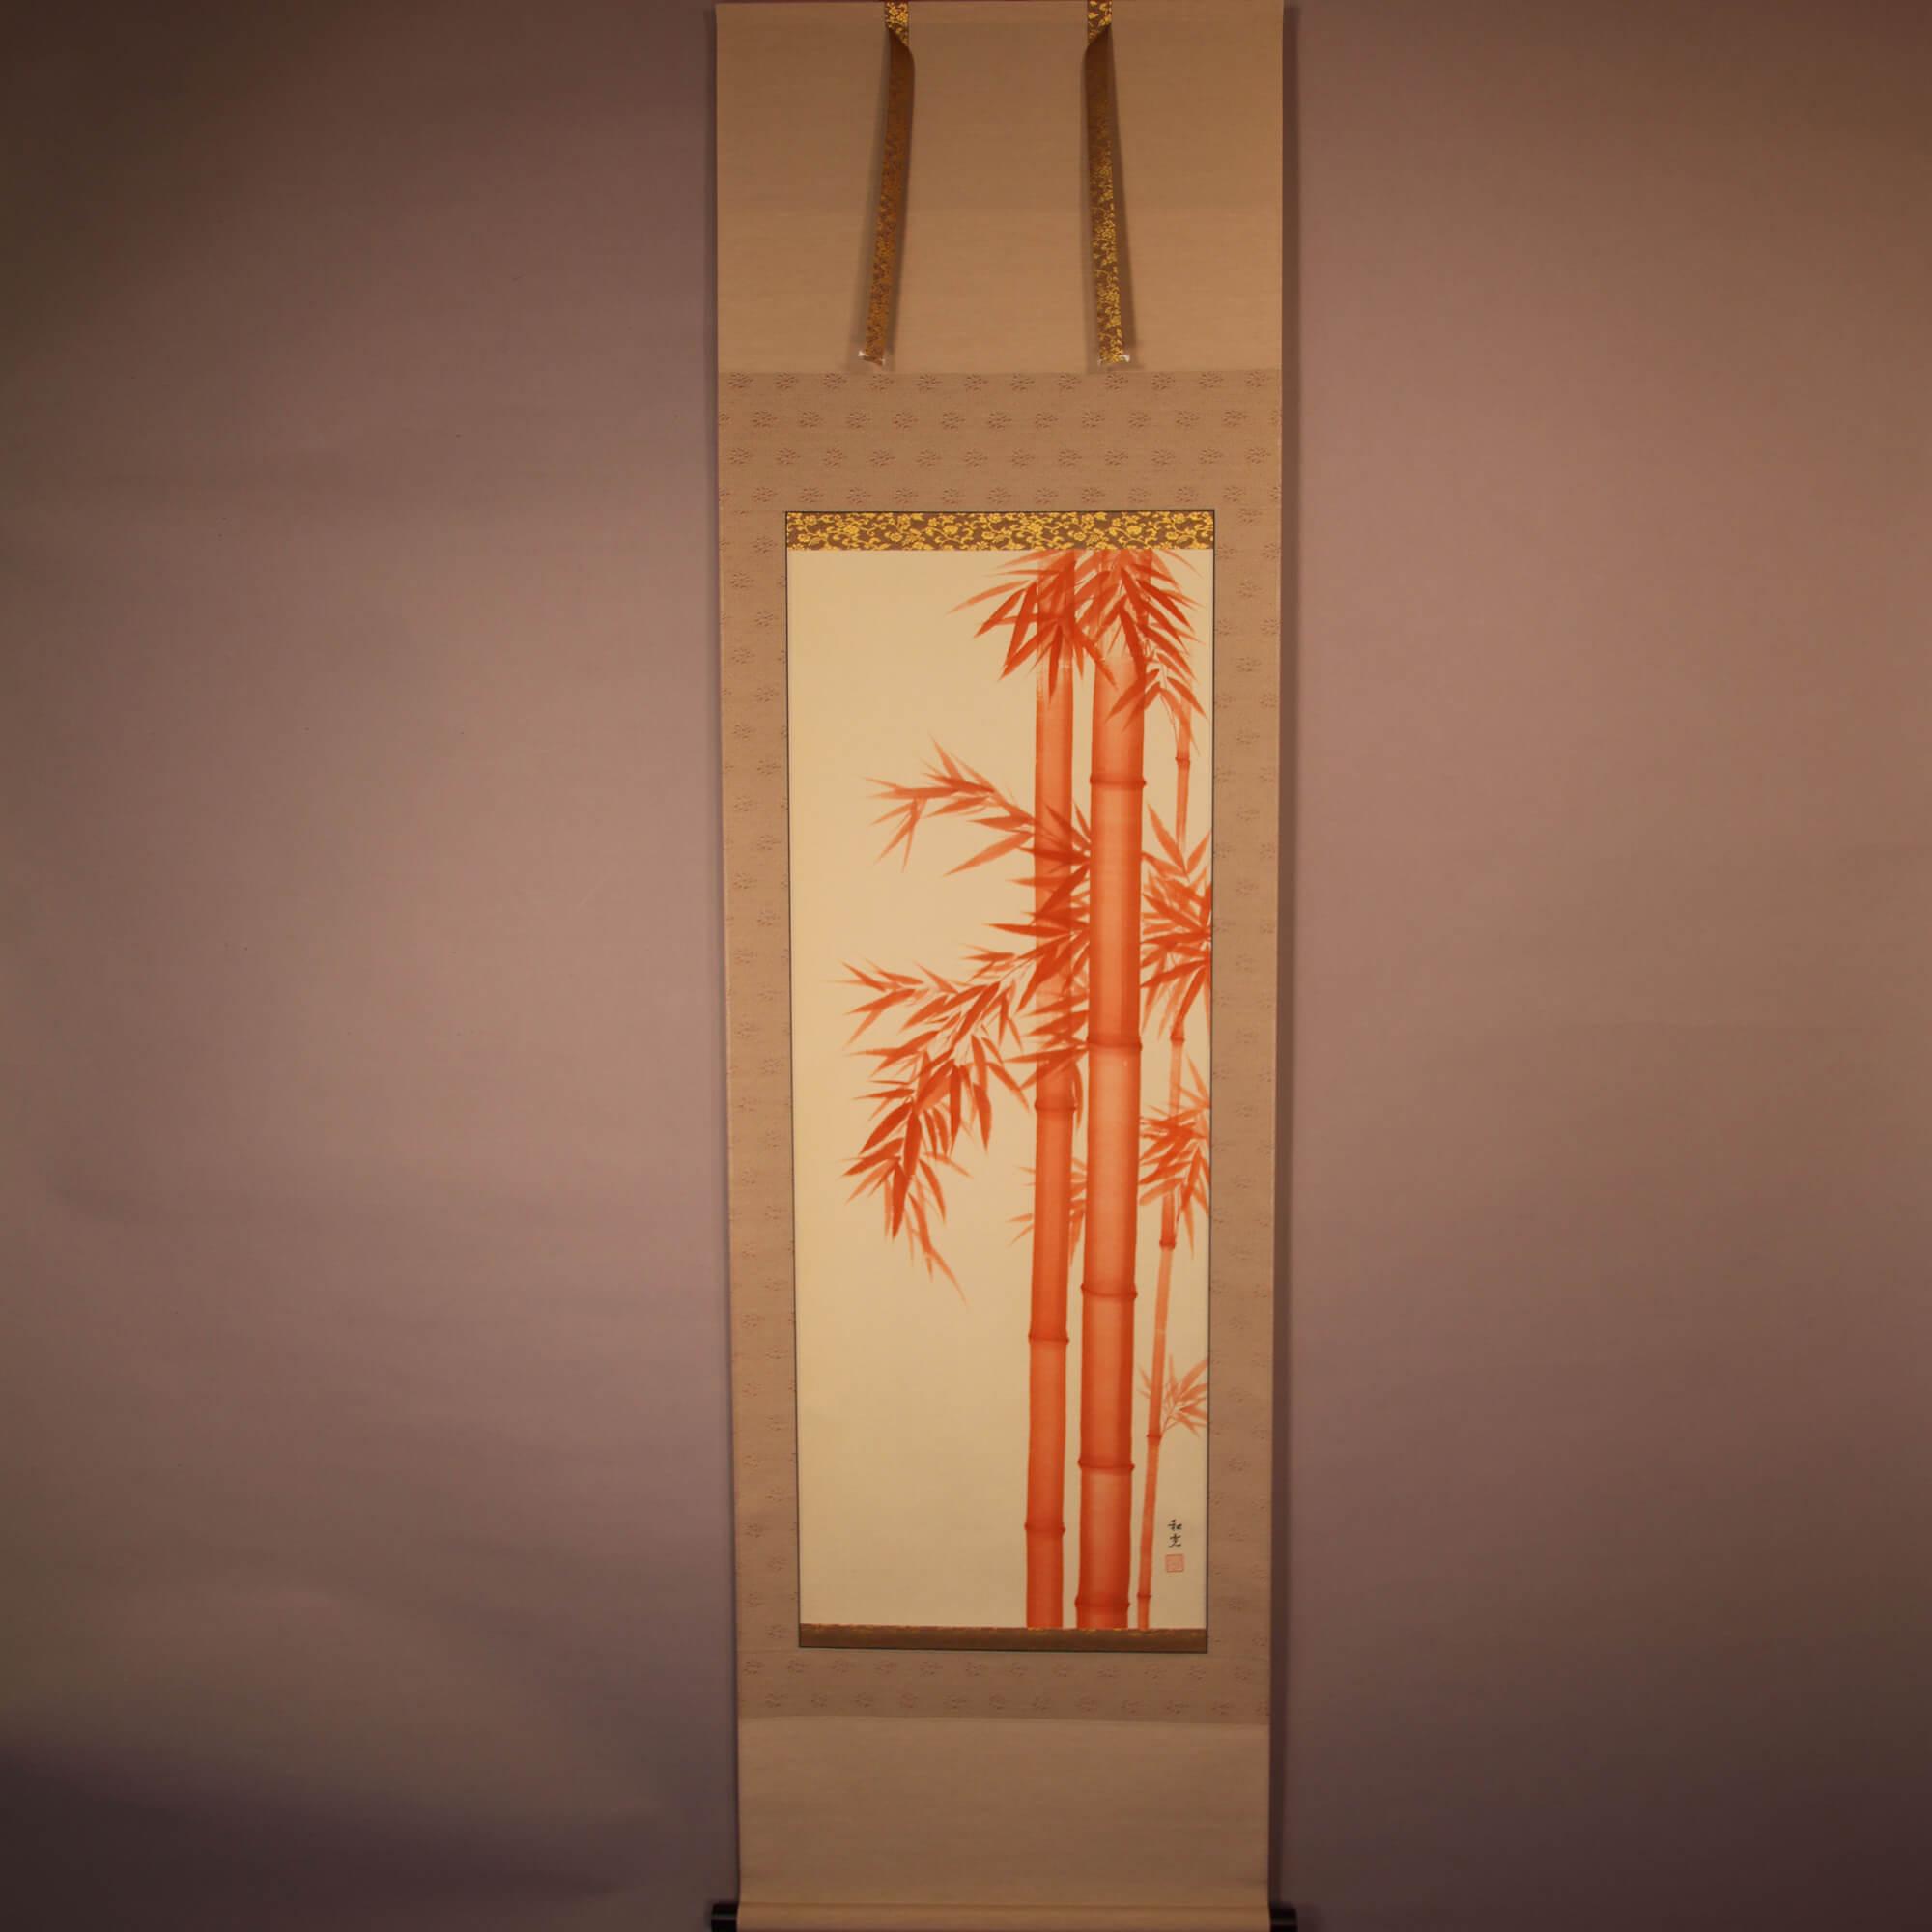 Vermilion Bamboo / Miyake Wakō